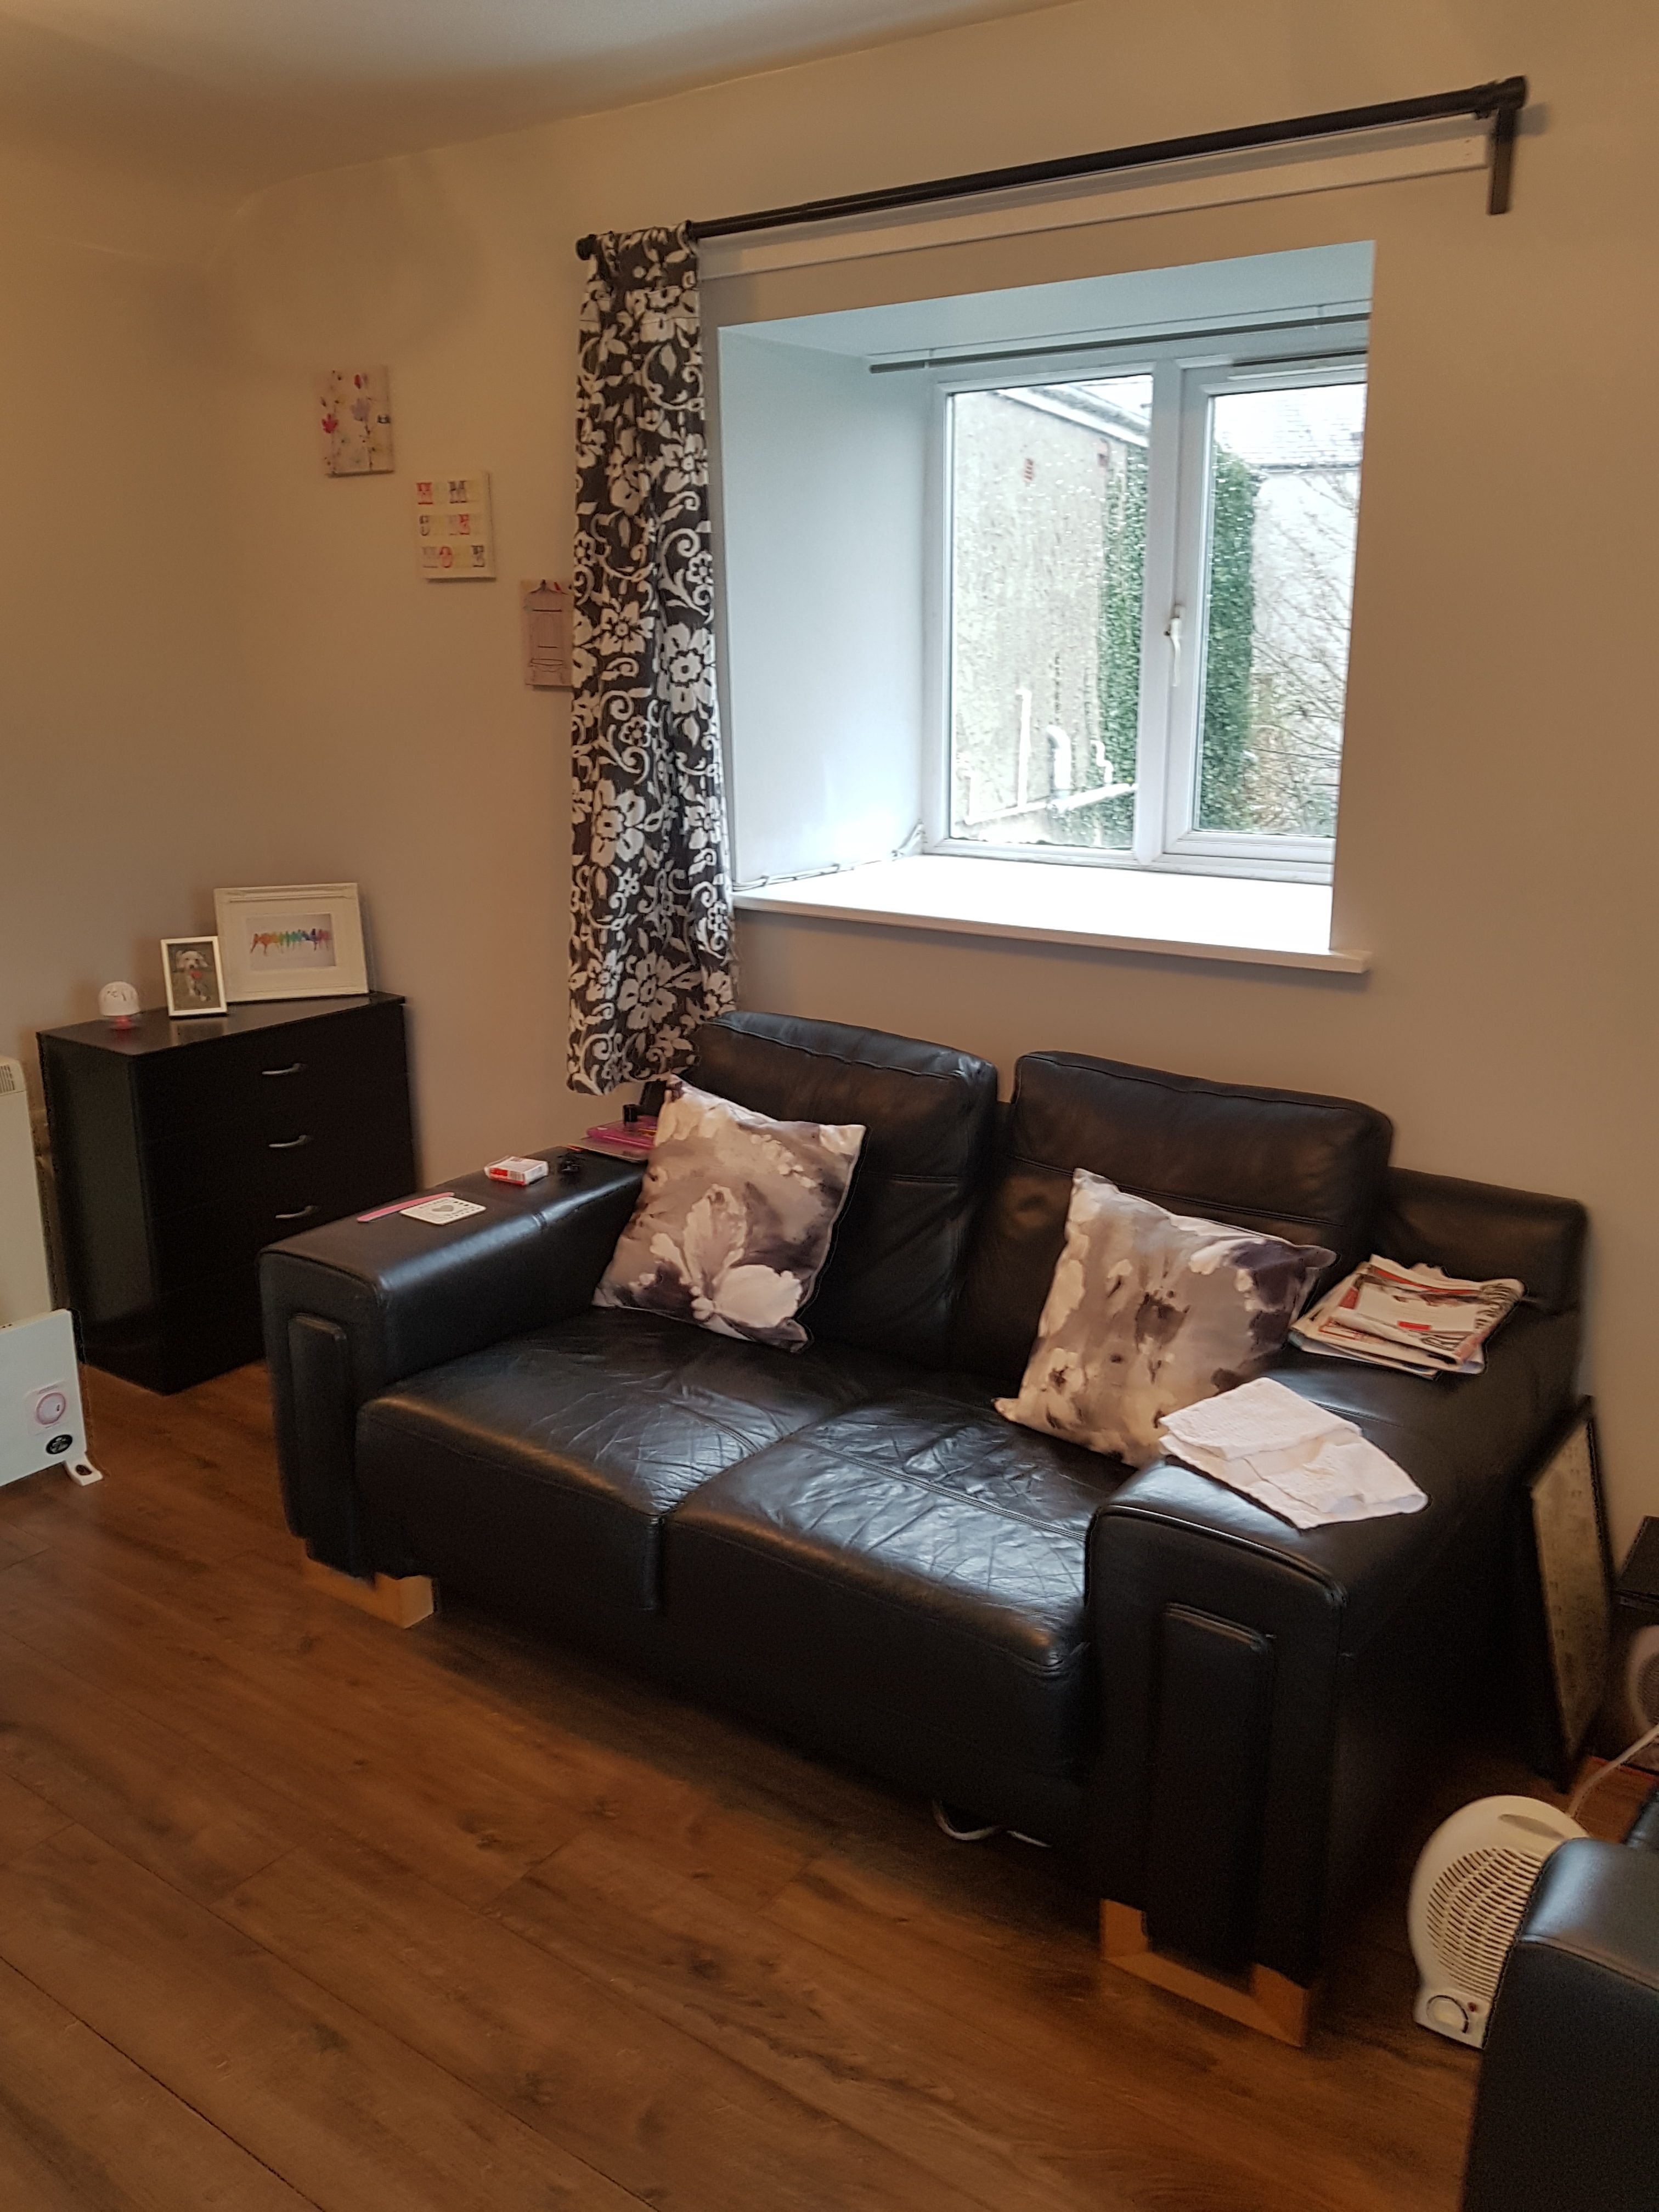 Flat 6, Mona House, Church Street, Llangefni, Anglesey. LL77 7DU